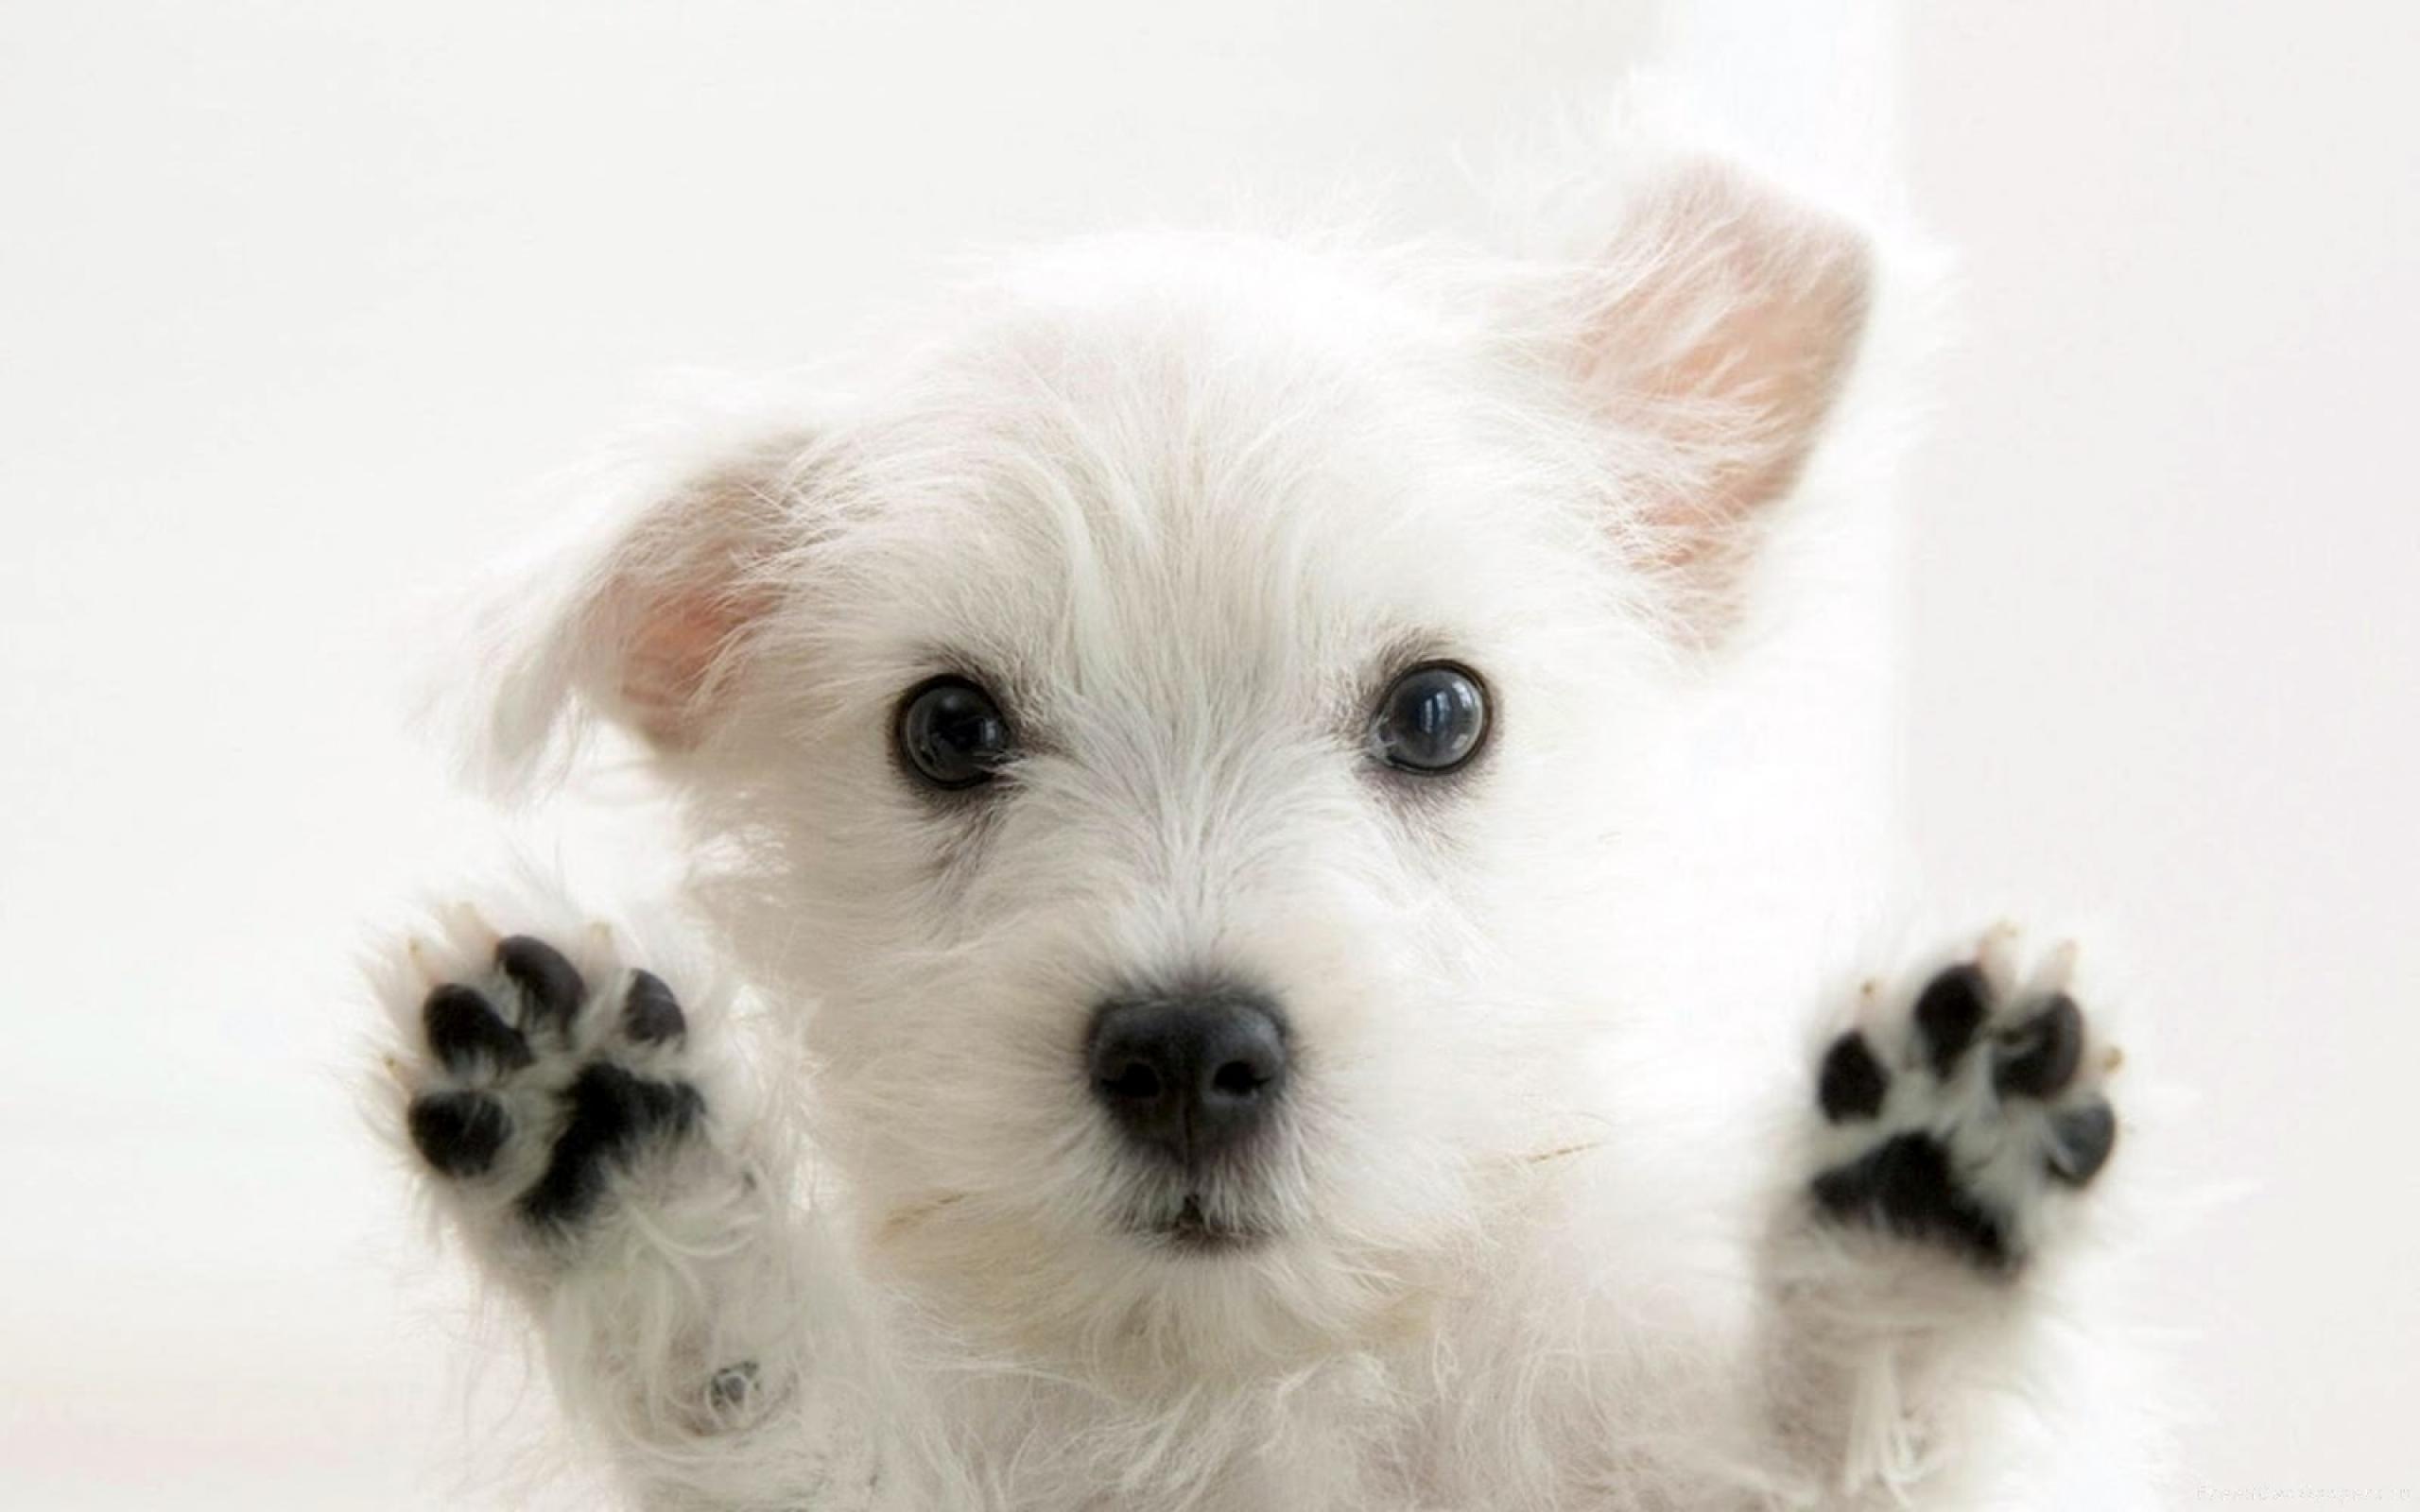 Mamy psy. :)